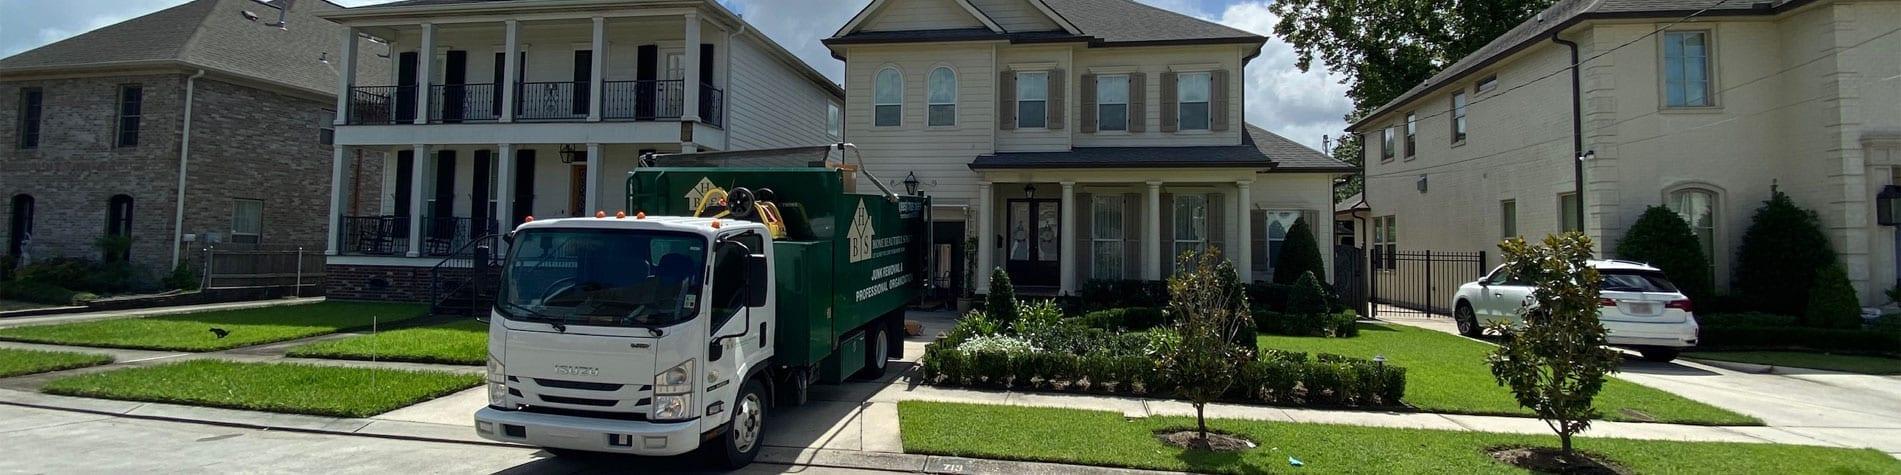 Junk Removal New Orleans Neighborhood HBS Junk Removal